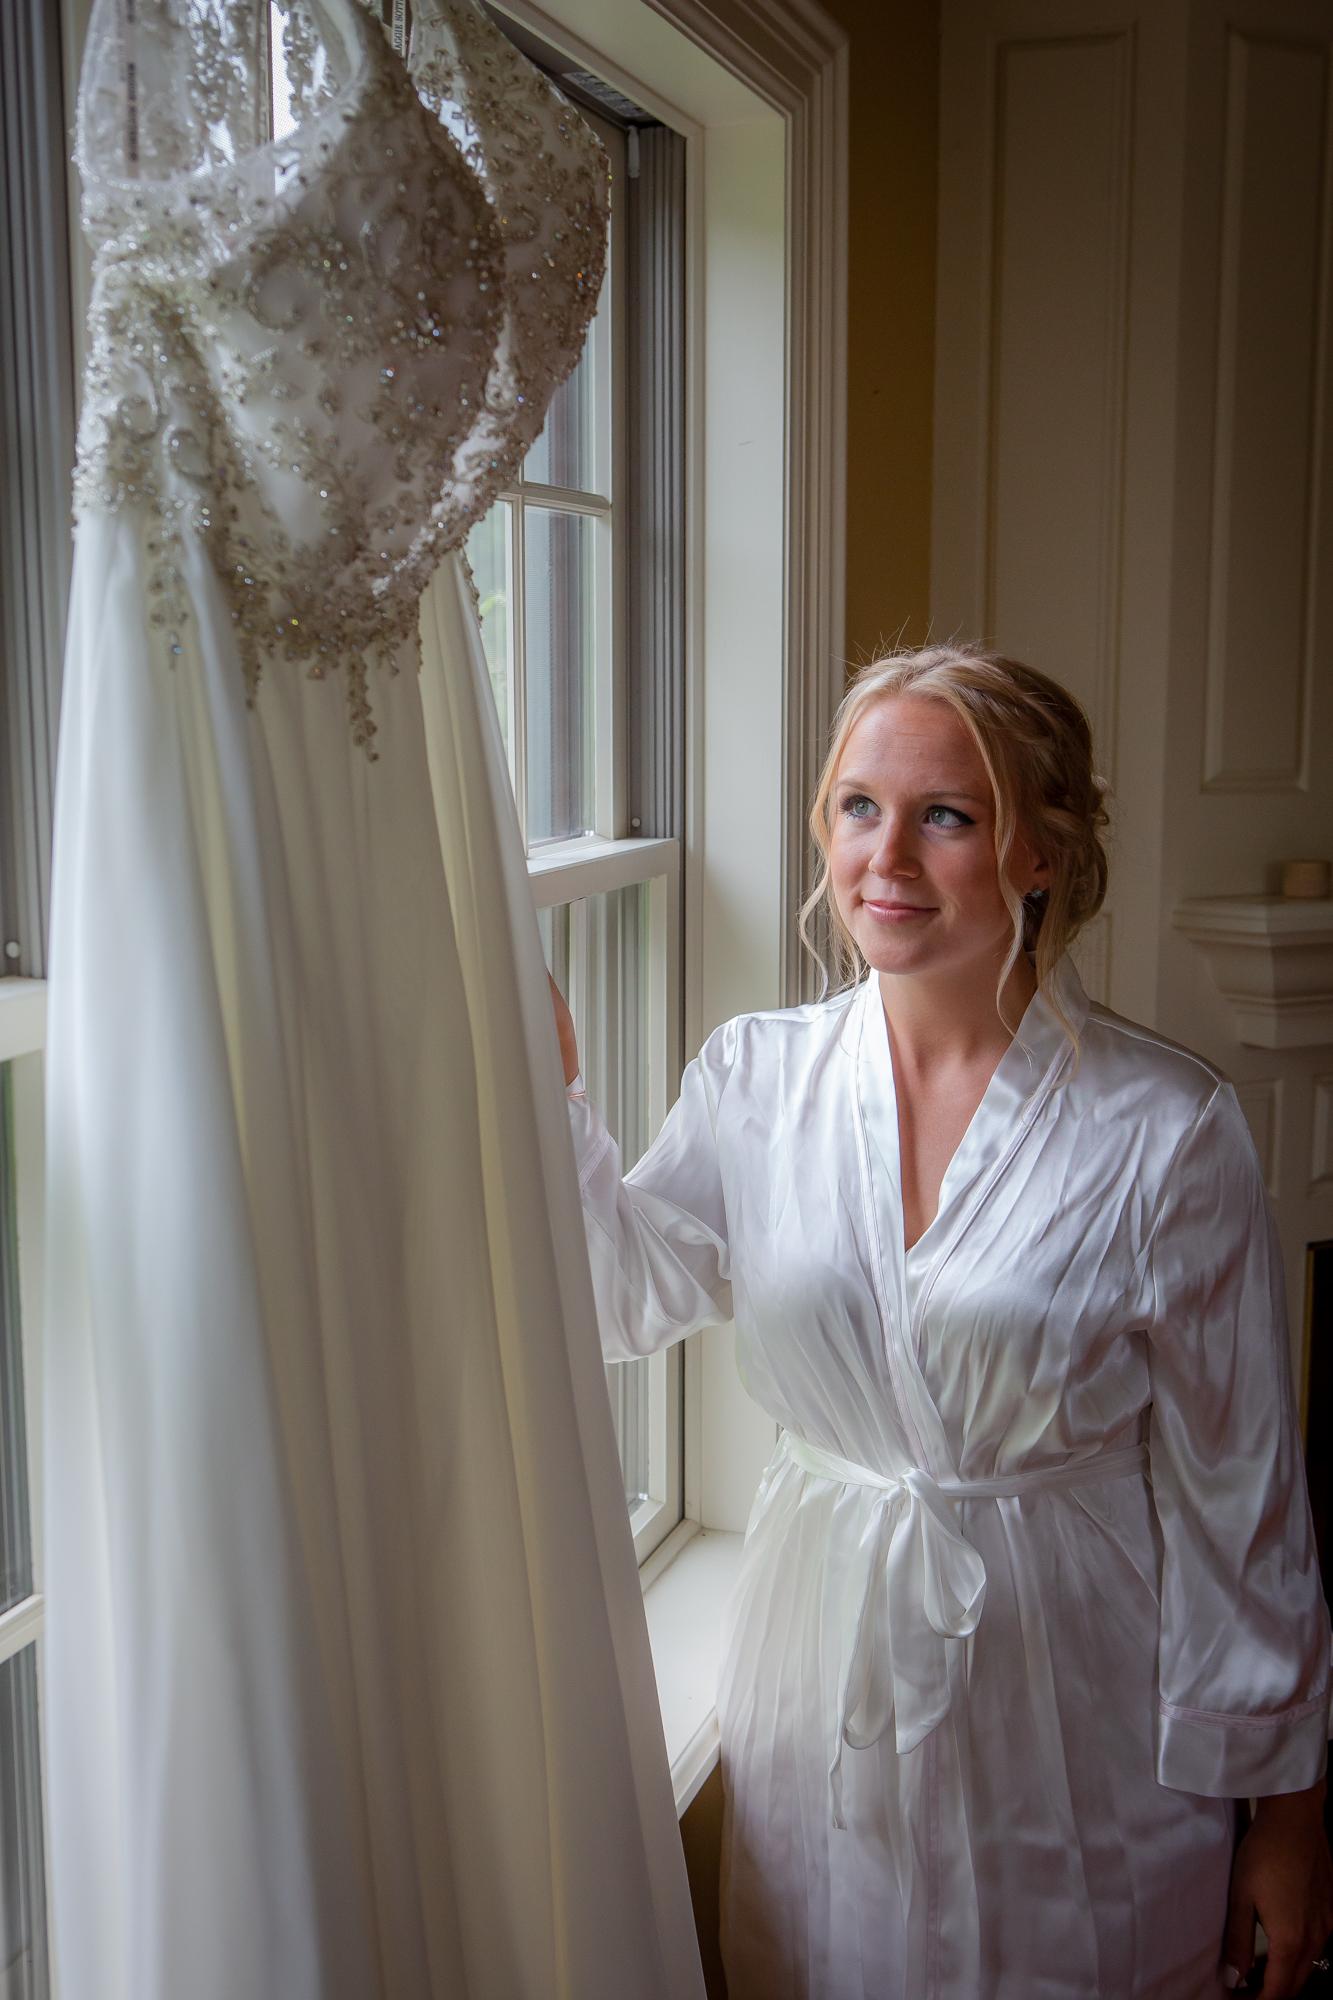 Wedding-Carriage-House-Oneonta-NY-0291.jpg